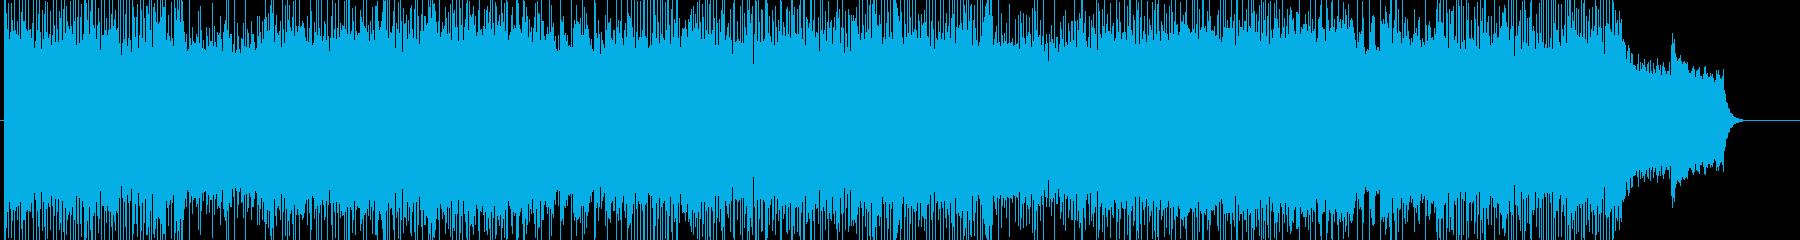 「HR/HM」「ROCK」BGM194の再生済みの波形